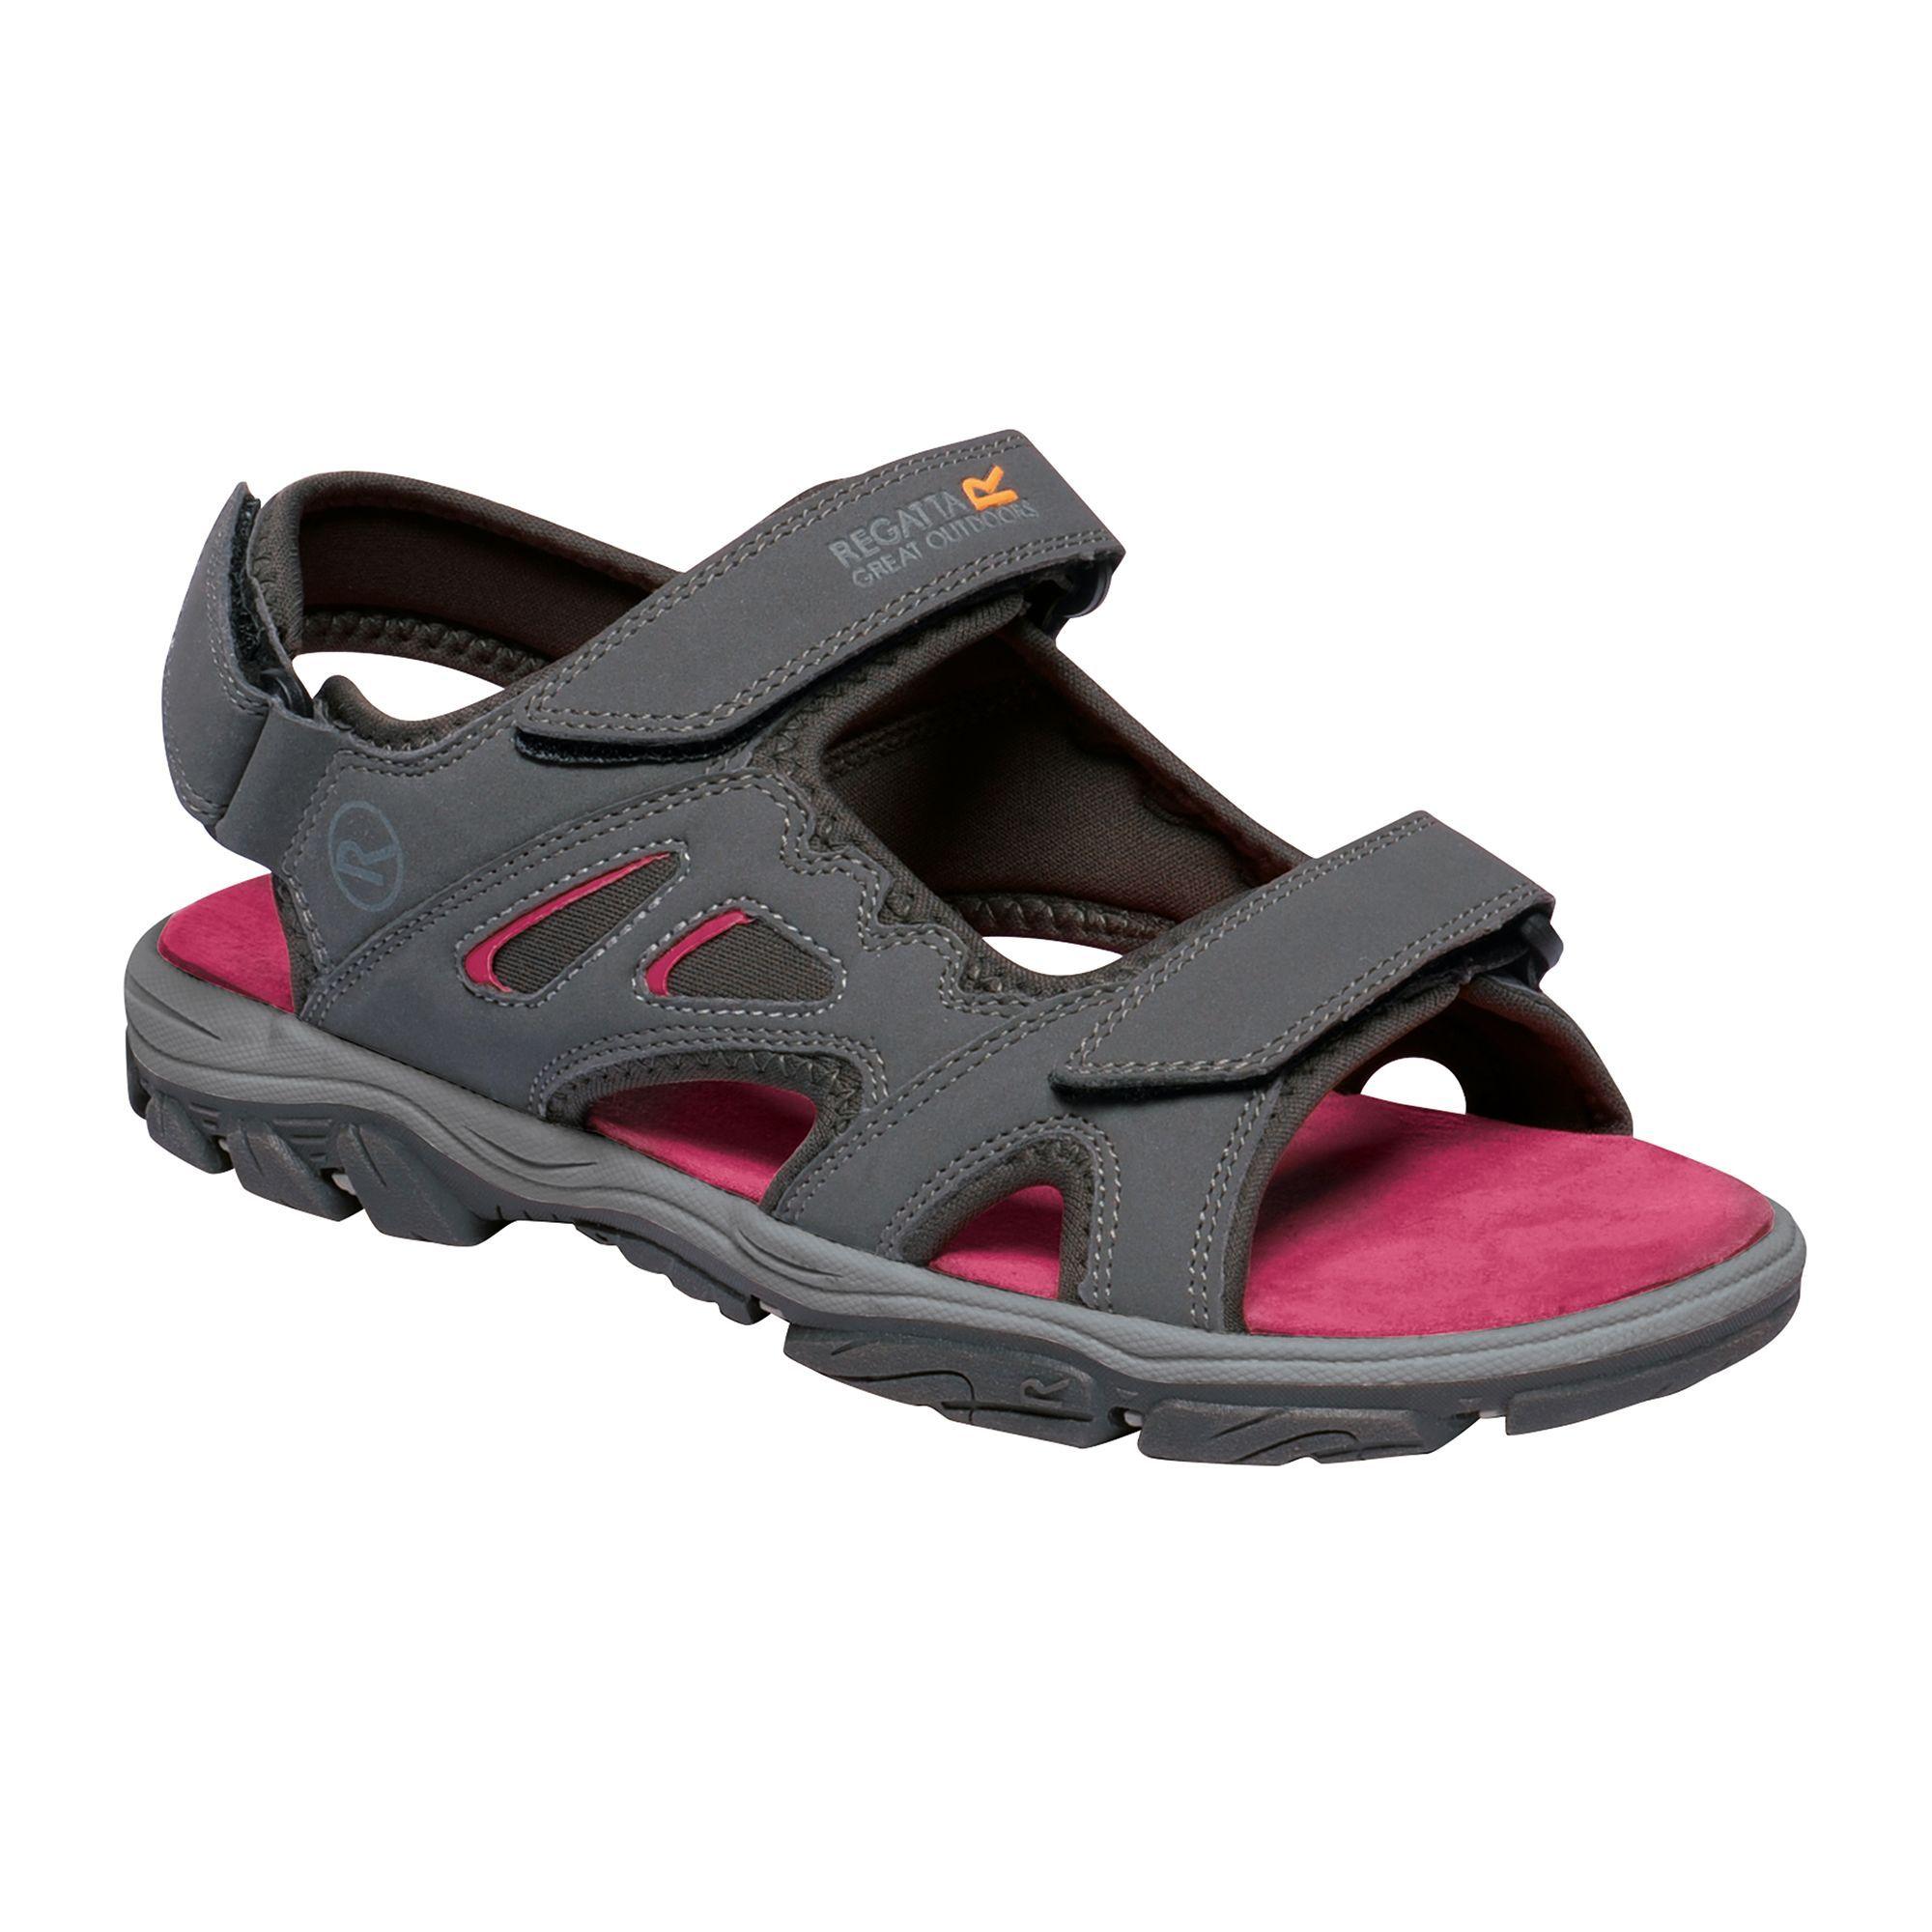 Regatta Womens/Ladies Holcombe Vent Sandals